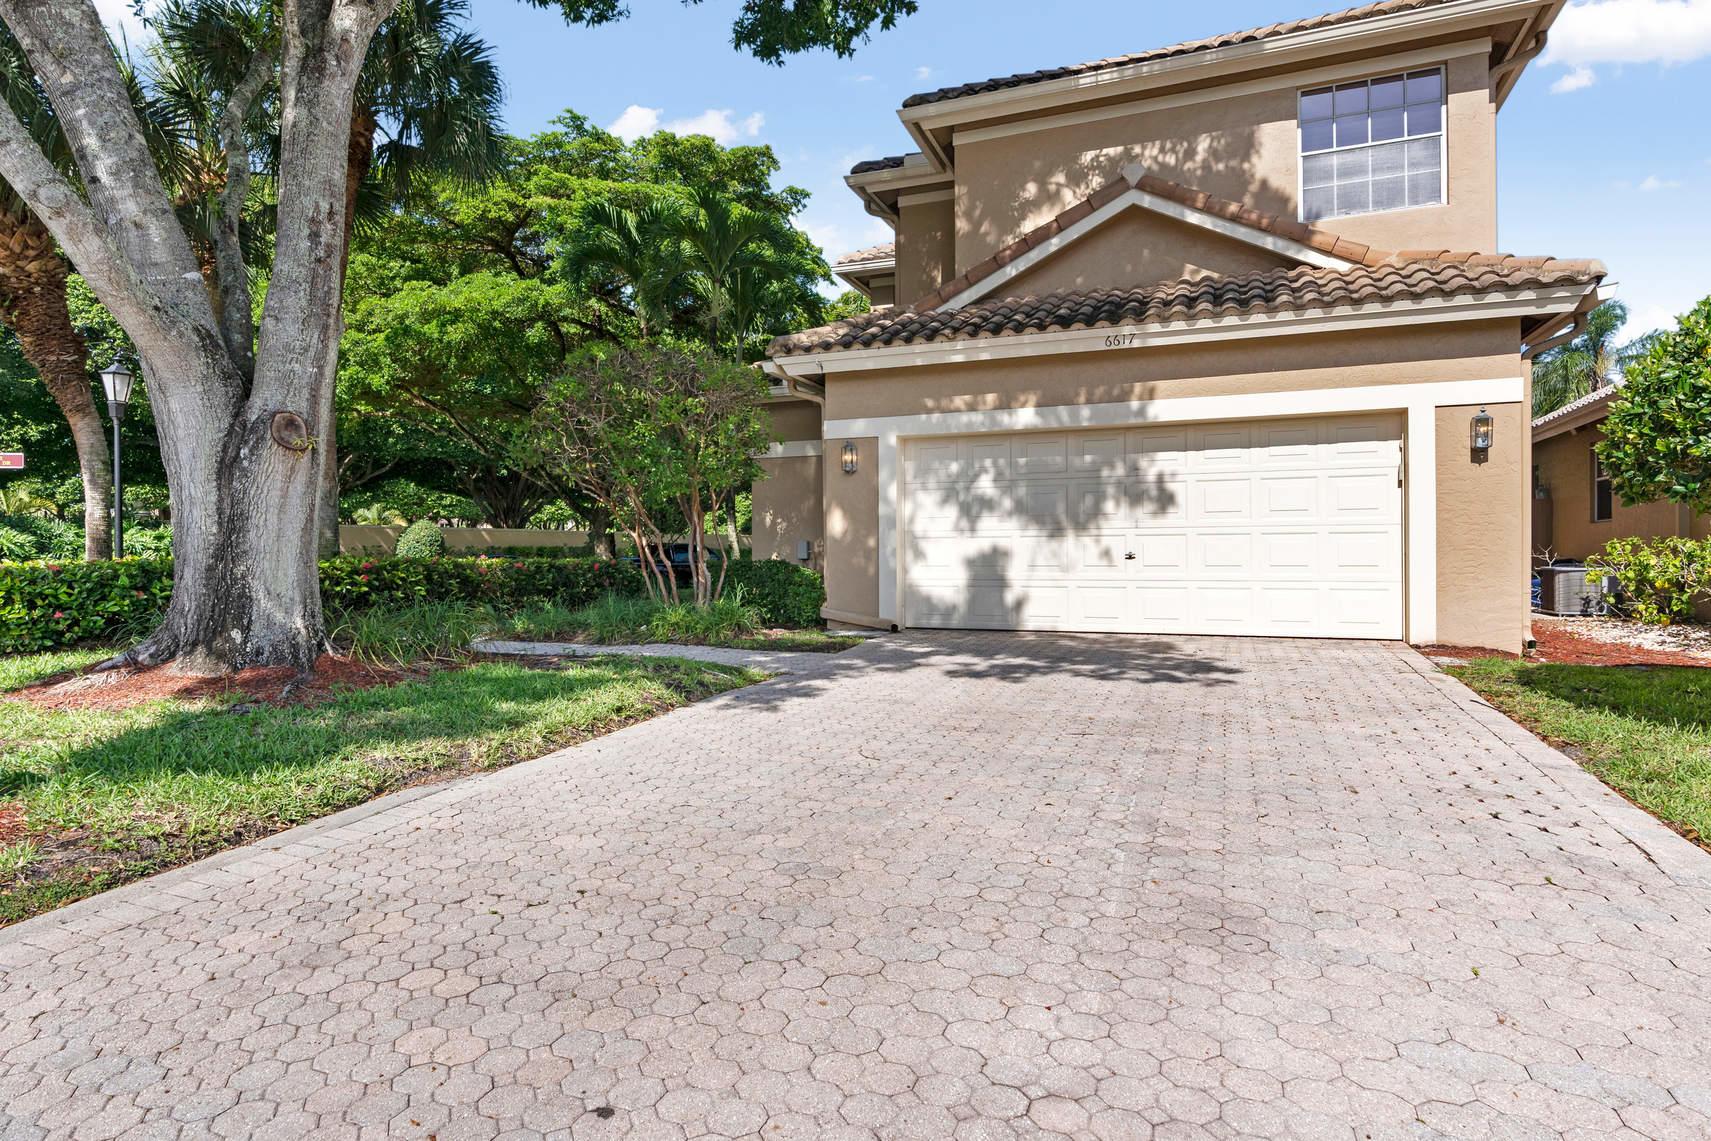 Photo of 6617 NW 25th Terrace, Boca Raton, FL 33496